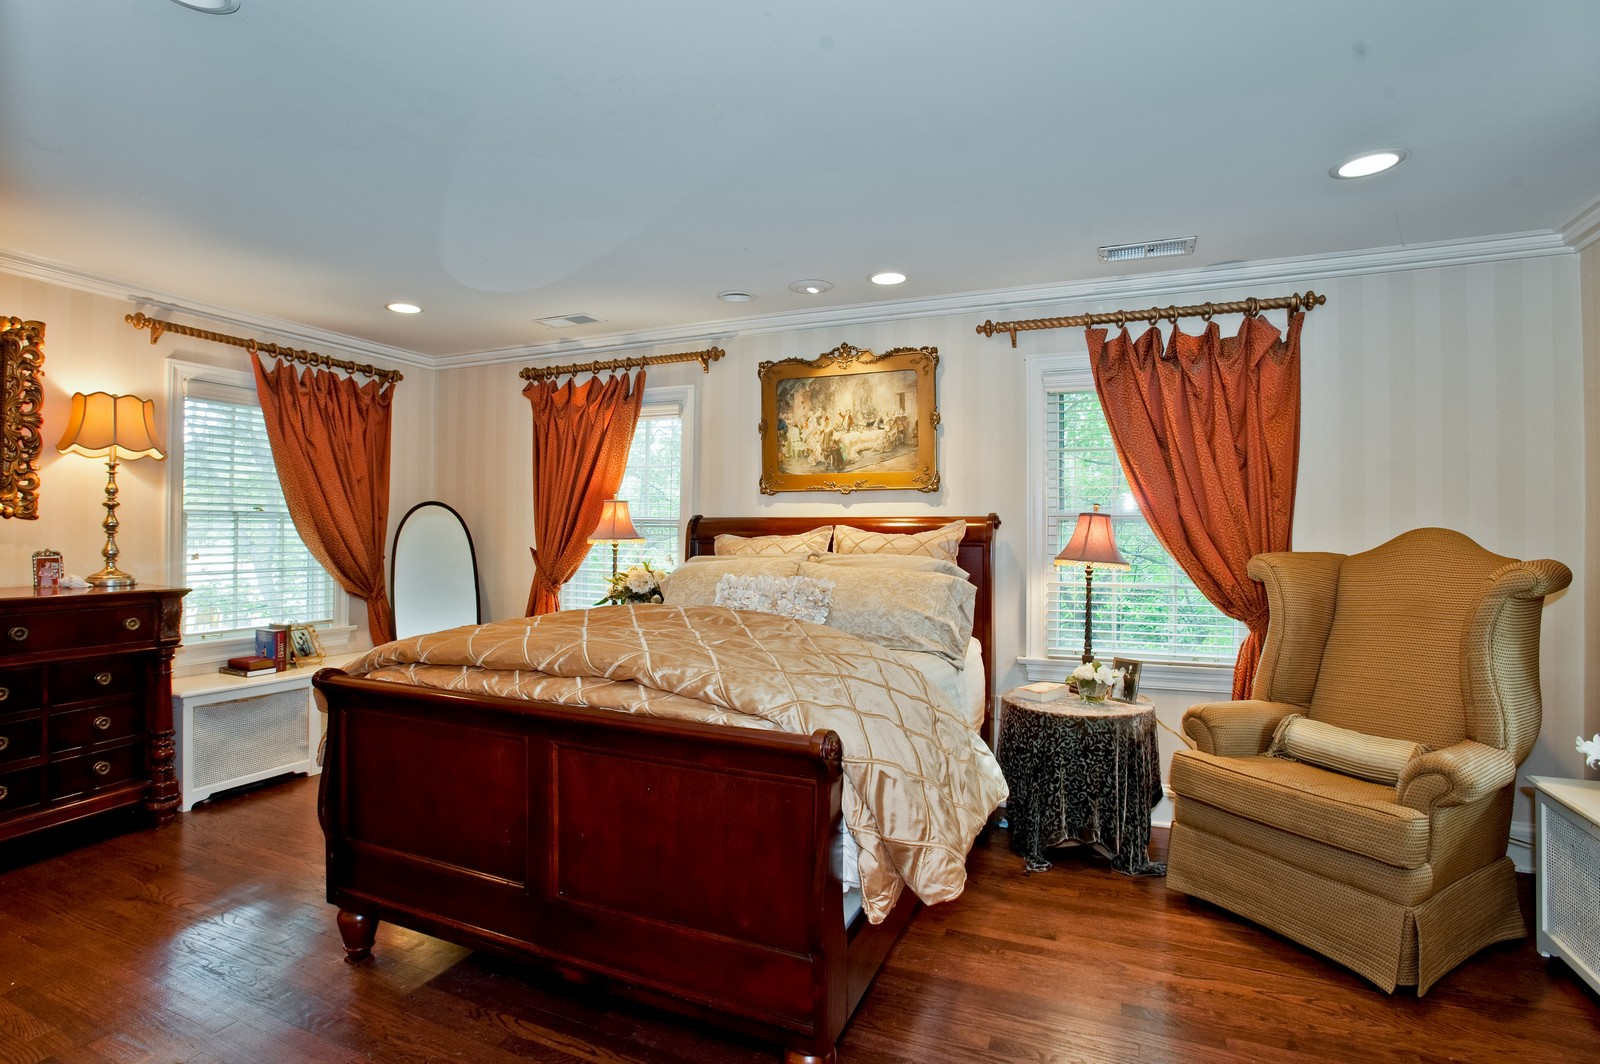 Real Estate Photography - 1161 Laurel, Winnetka, IL, 60093 - Master Bedroom